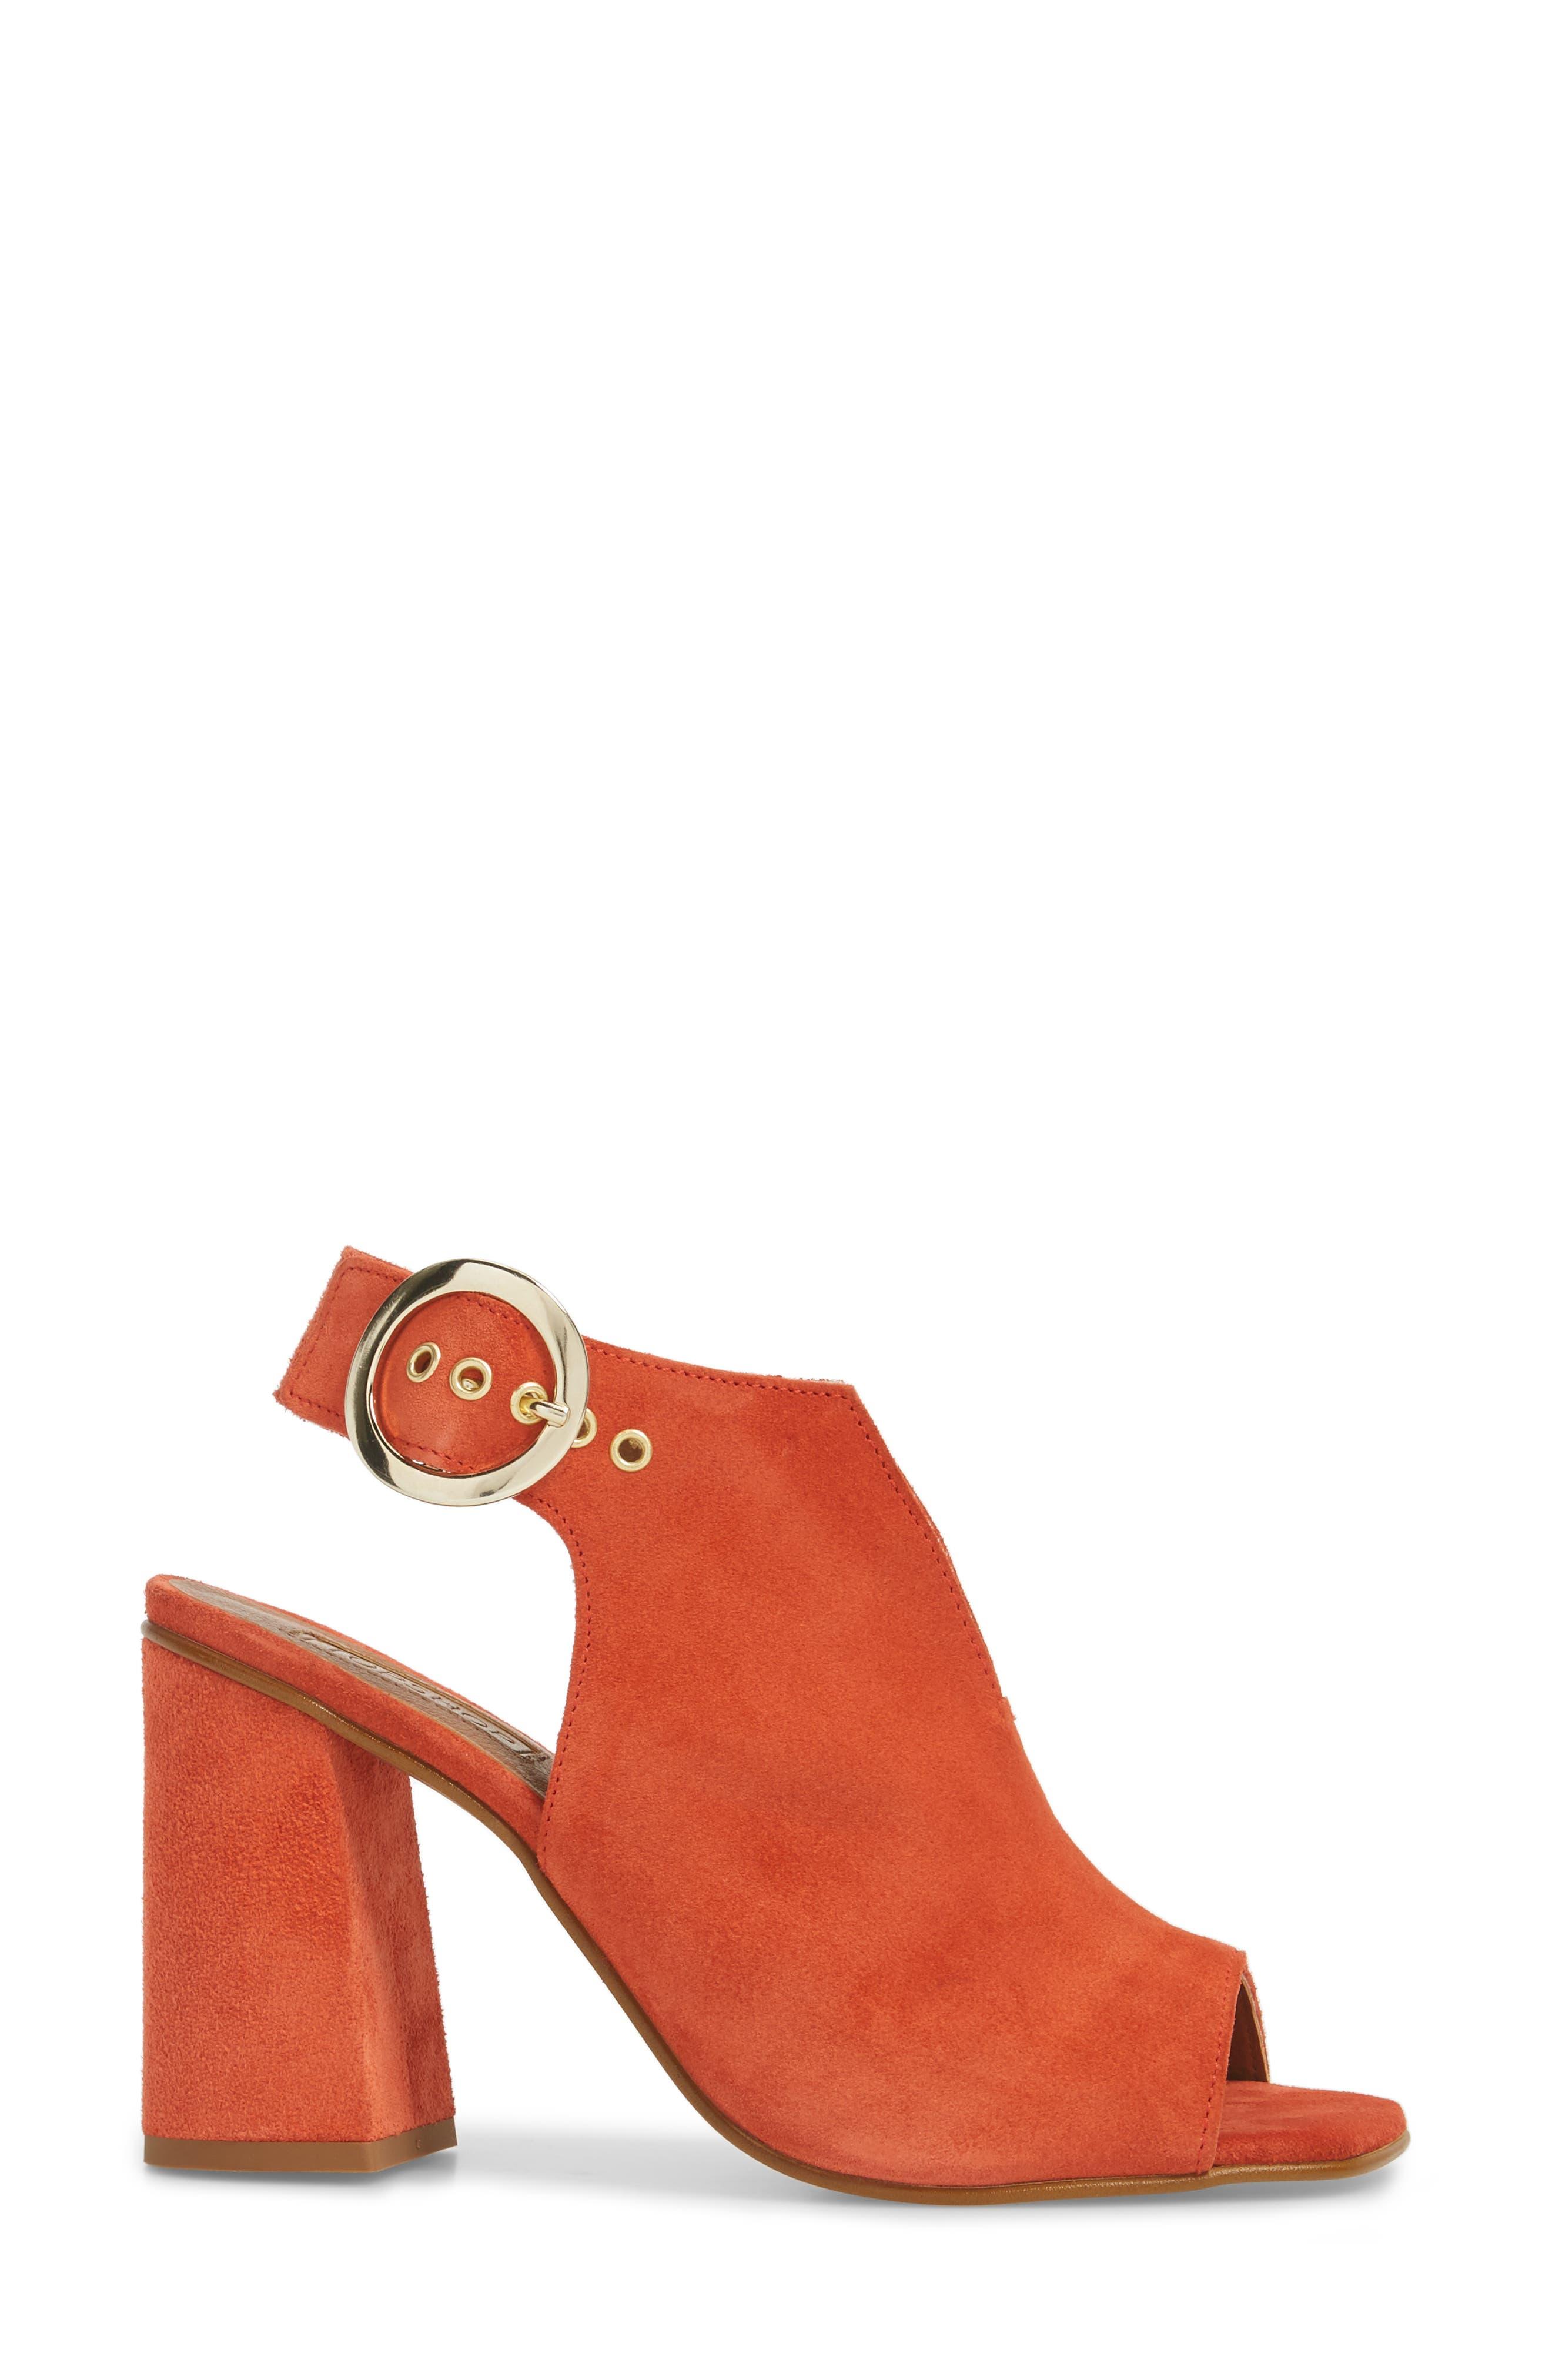 Nika Flared Heel Slingback Sandal,                             Alternate thumbnail 3, color,                             Orange